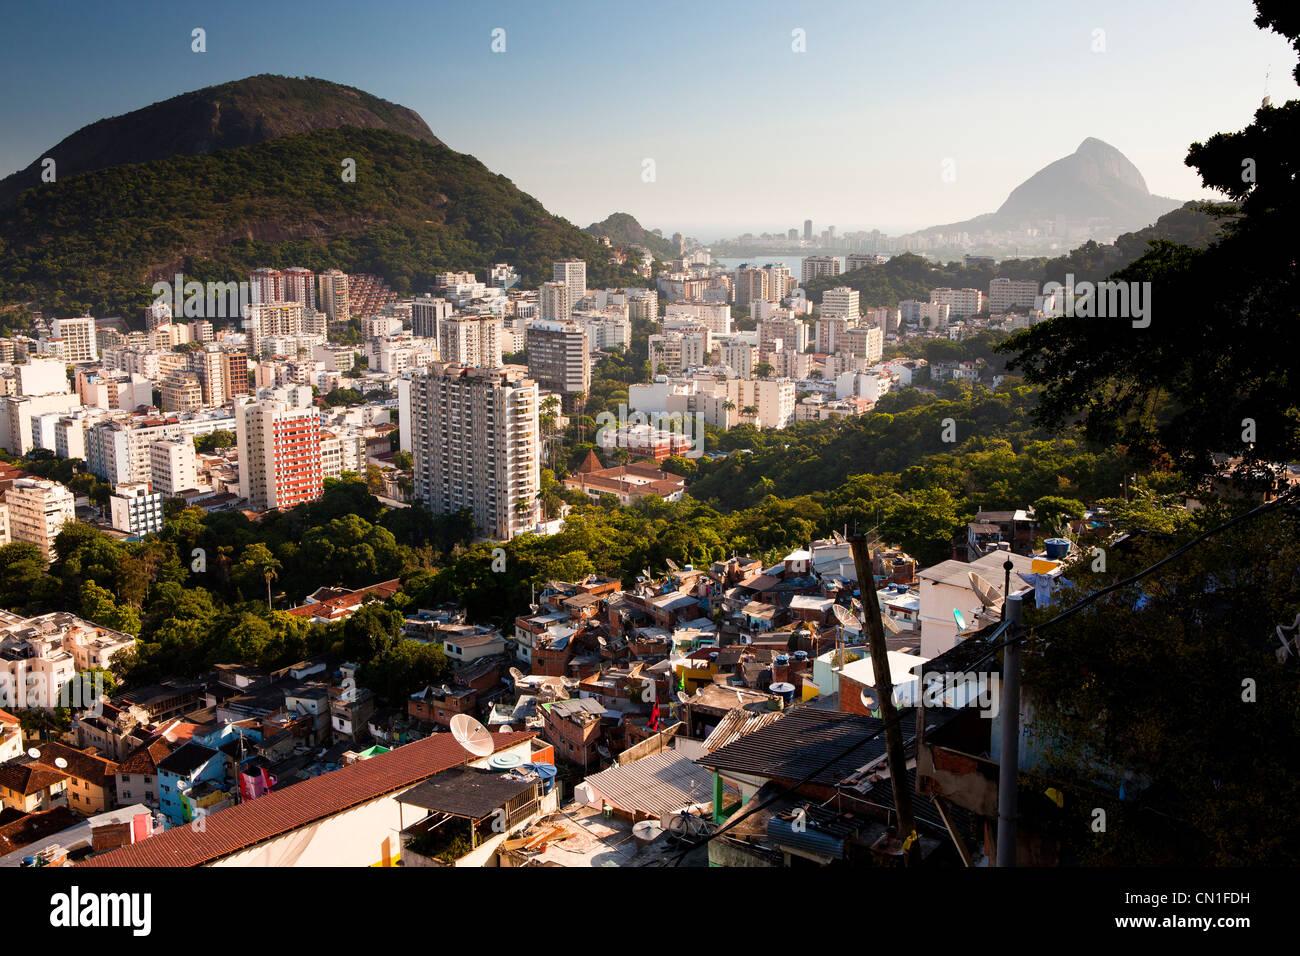 Barrio Botafogo y la Laguna Rodrigo de Freitas, visto desde la favela Santa Marta de Río de Janeiro, Brasil, Imagen De Stock